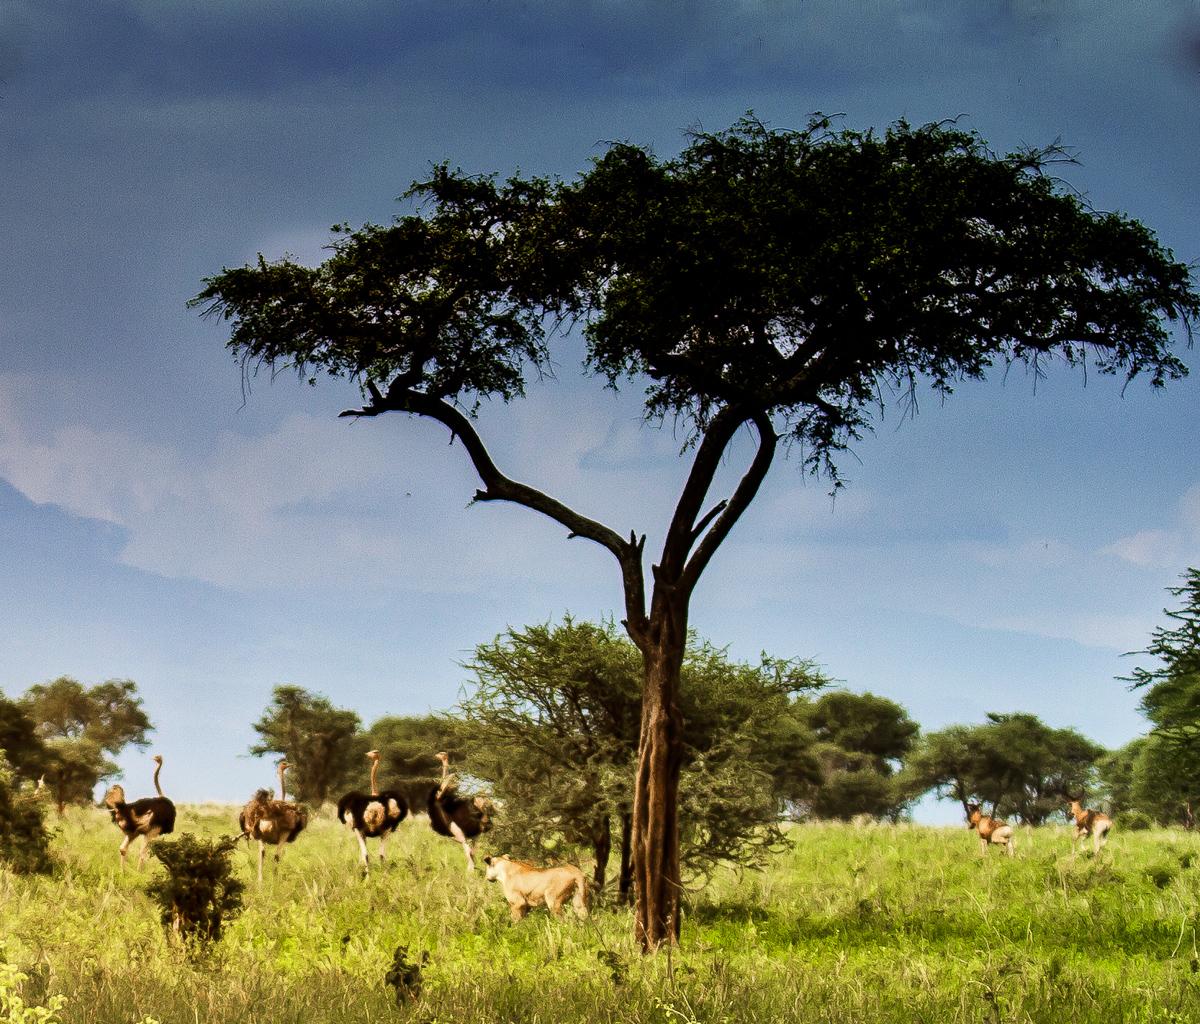 africa-1170-Edit-Edit-Edit.jpg